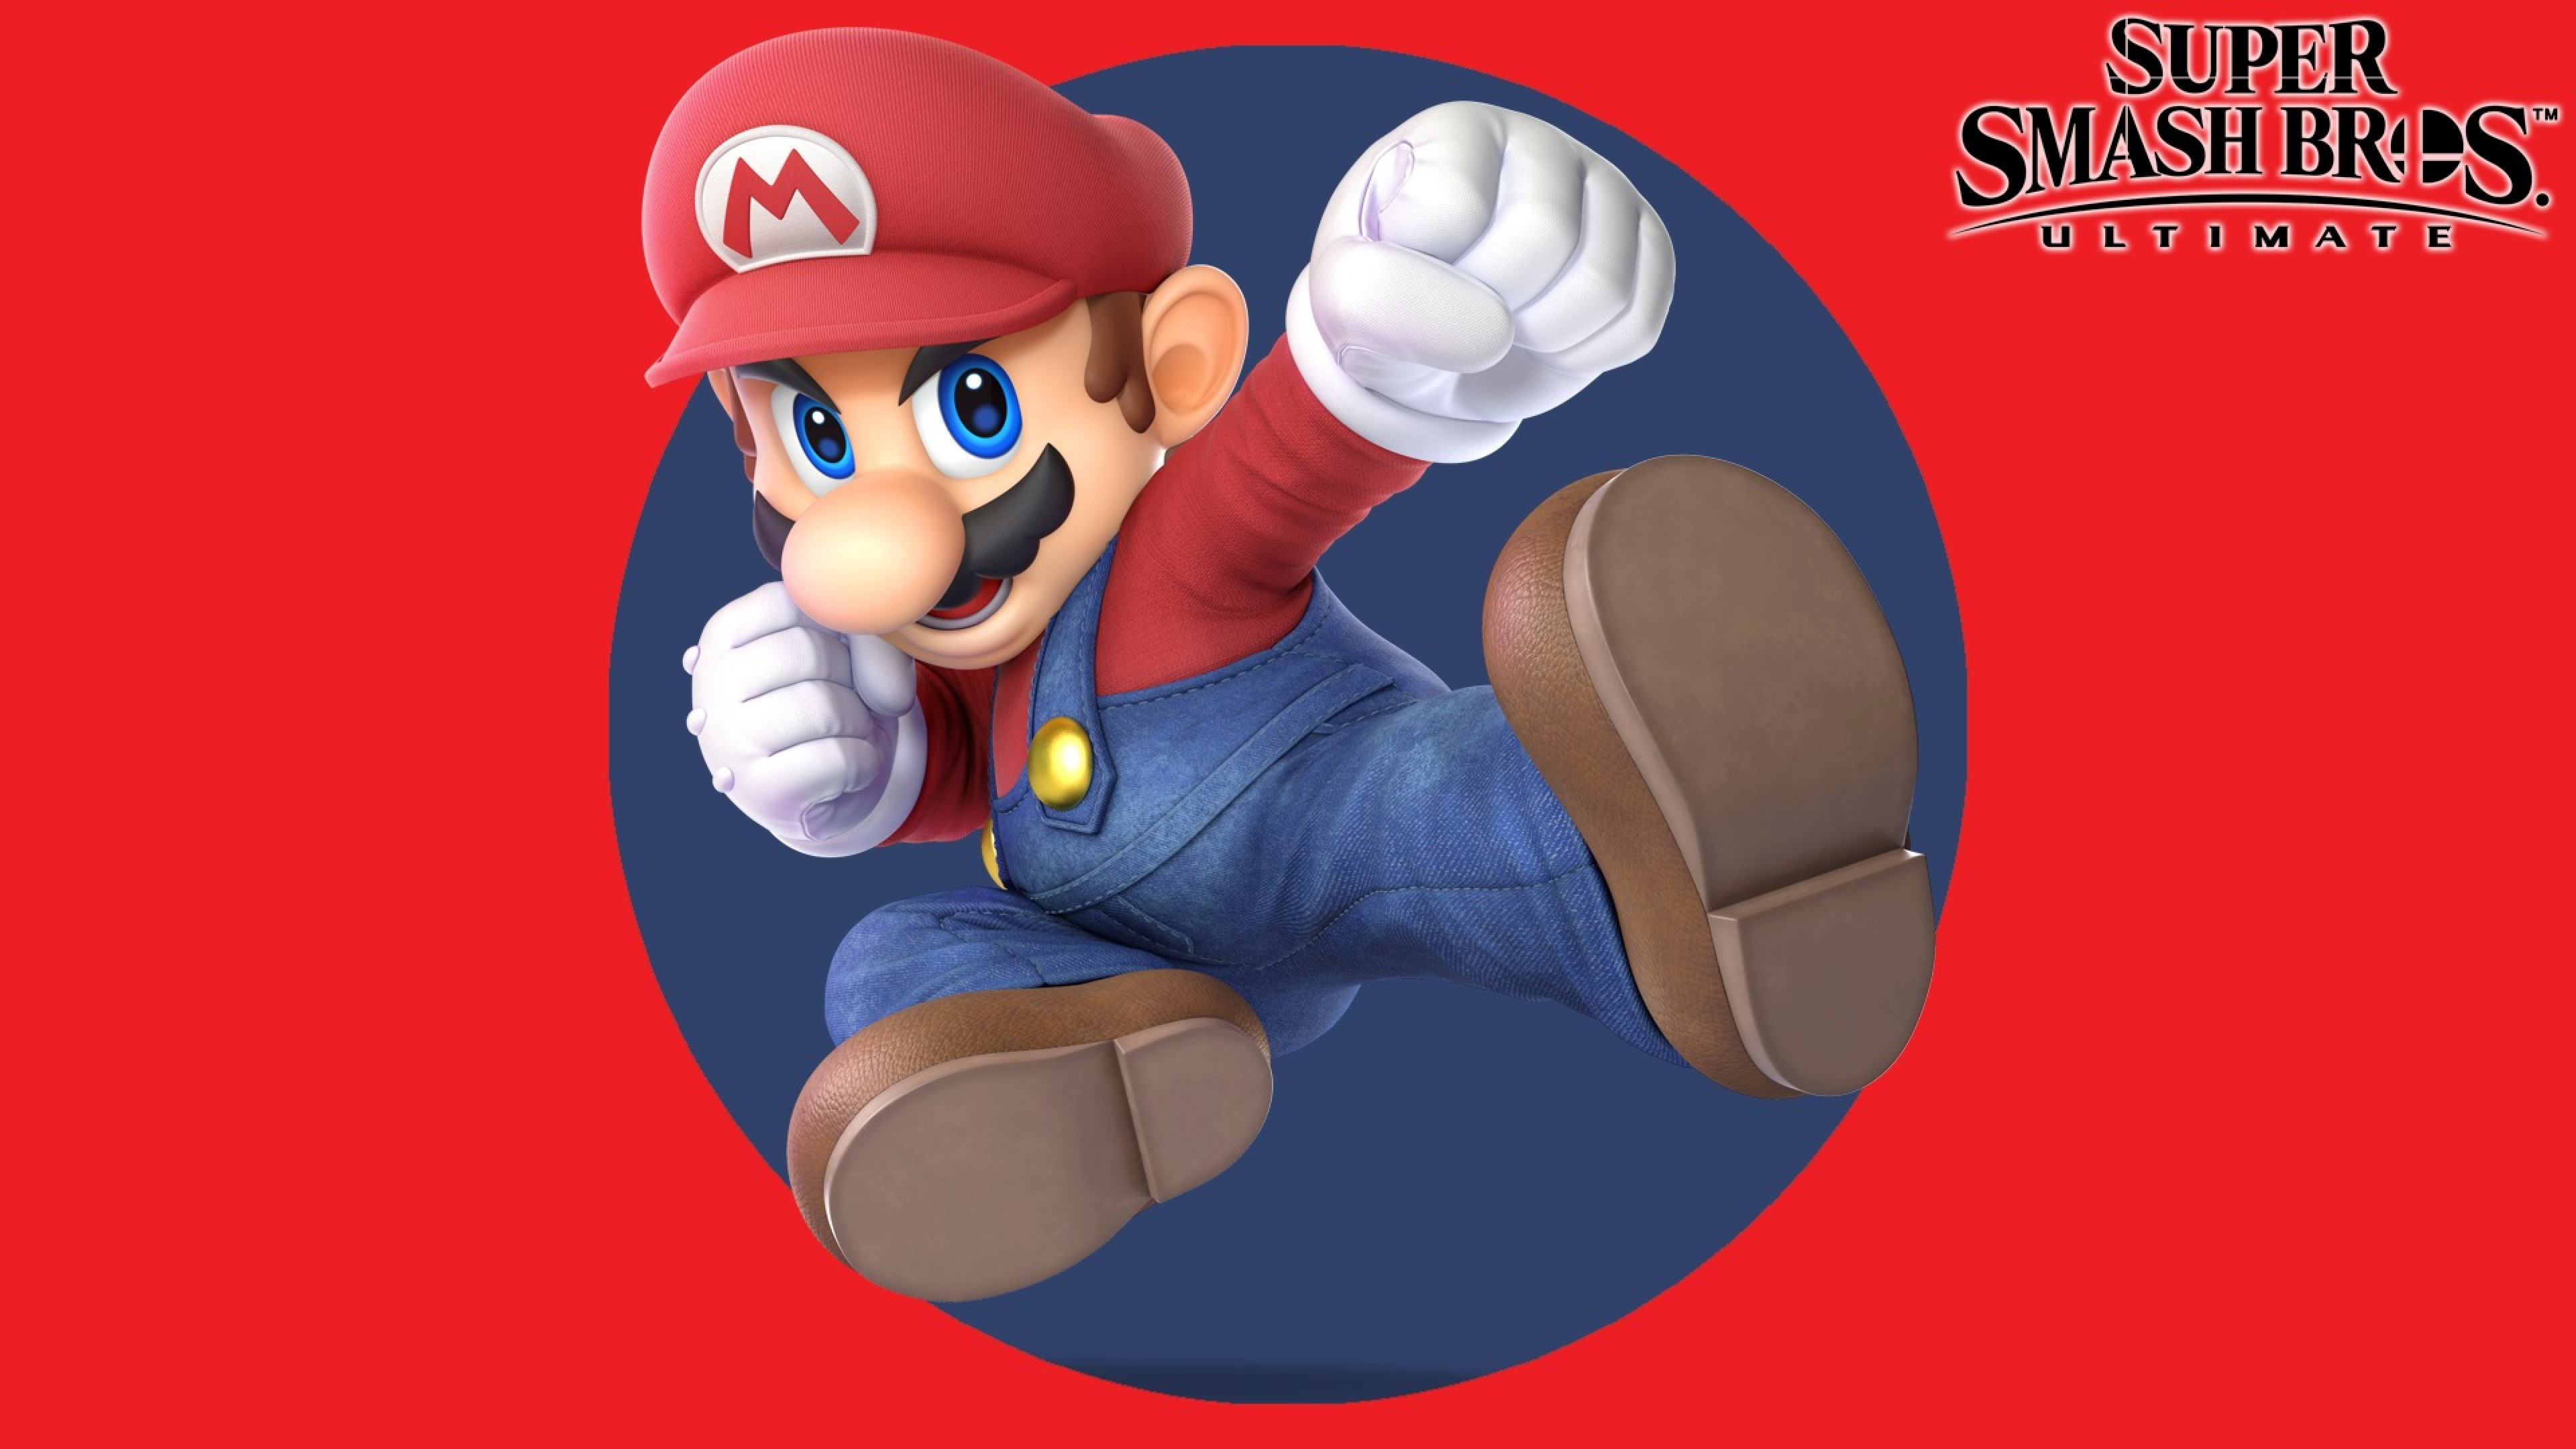 3840x2160 Super Mario Super Smash Bros Ultimate 4k Wallpaper